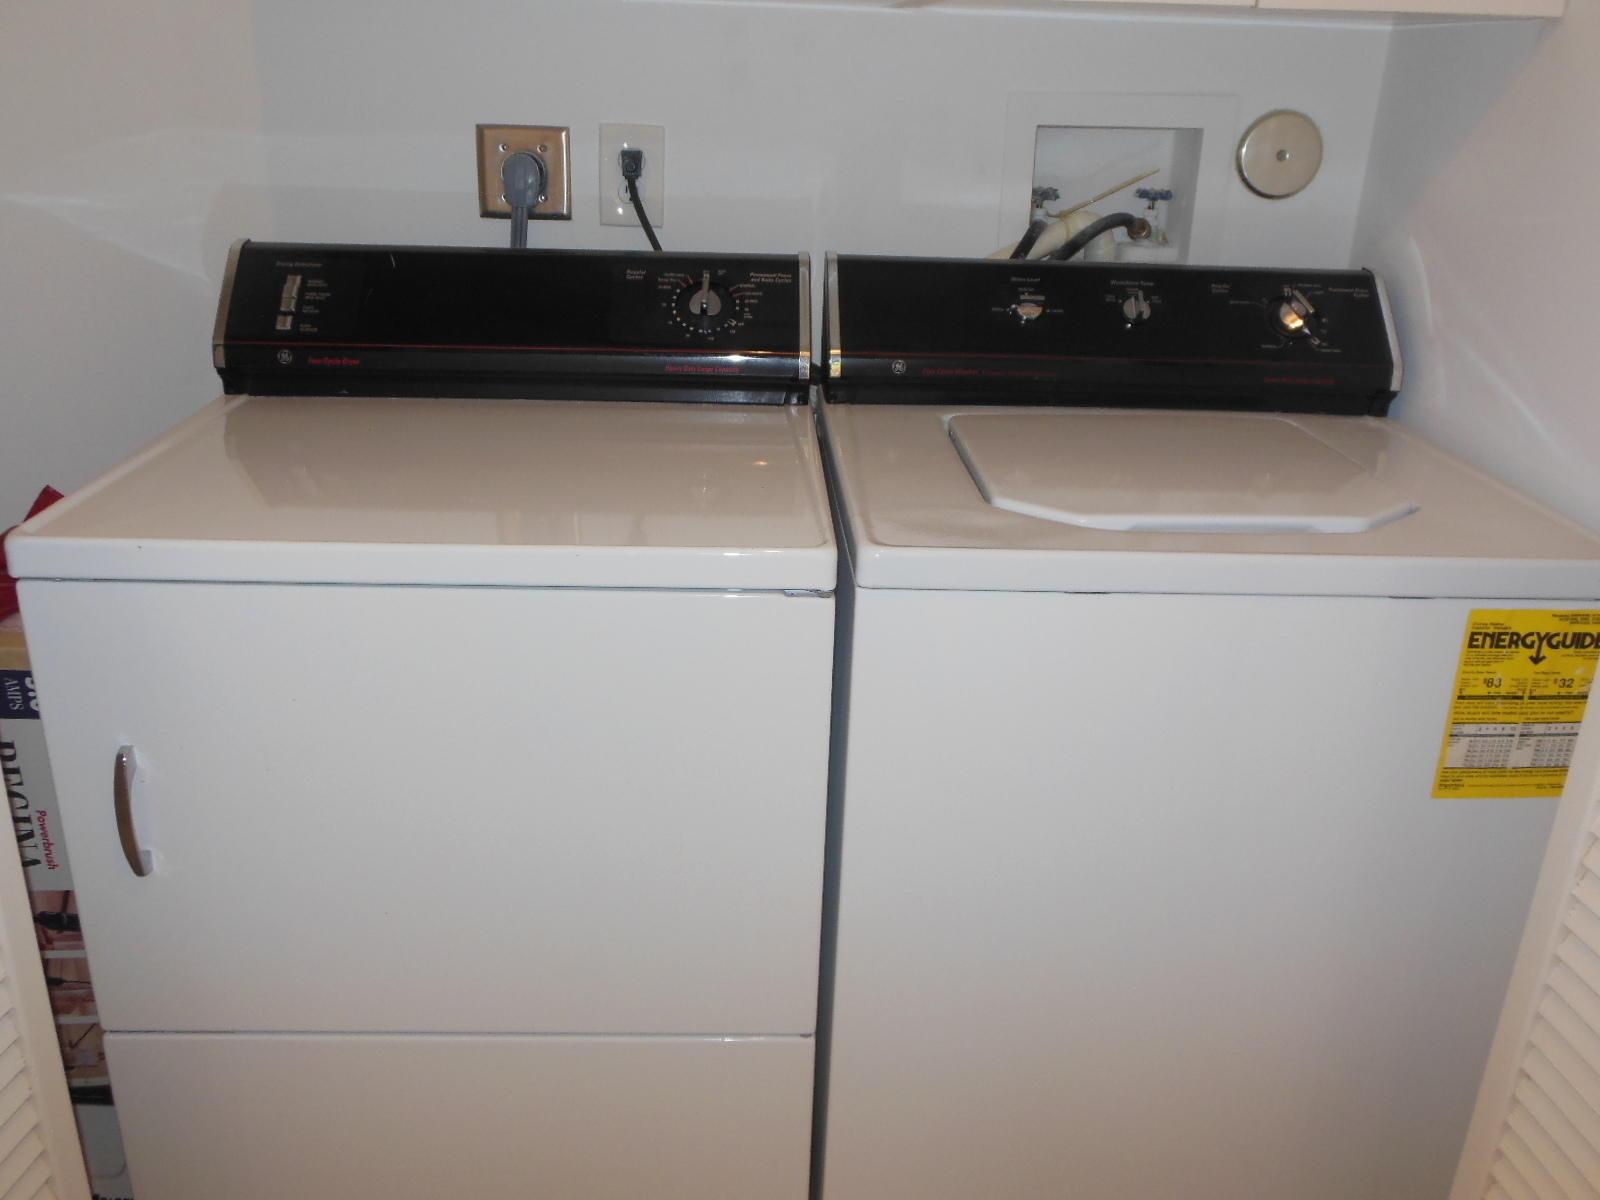 Inside Washer/Dryer